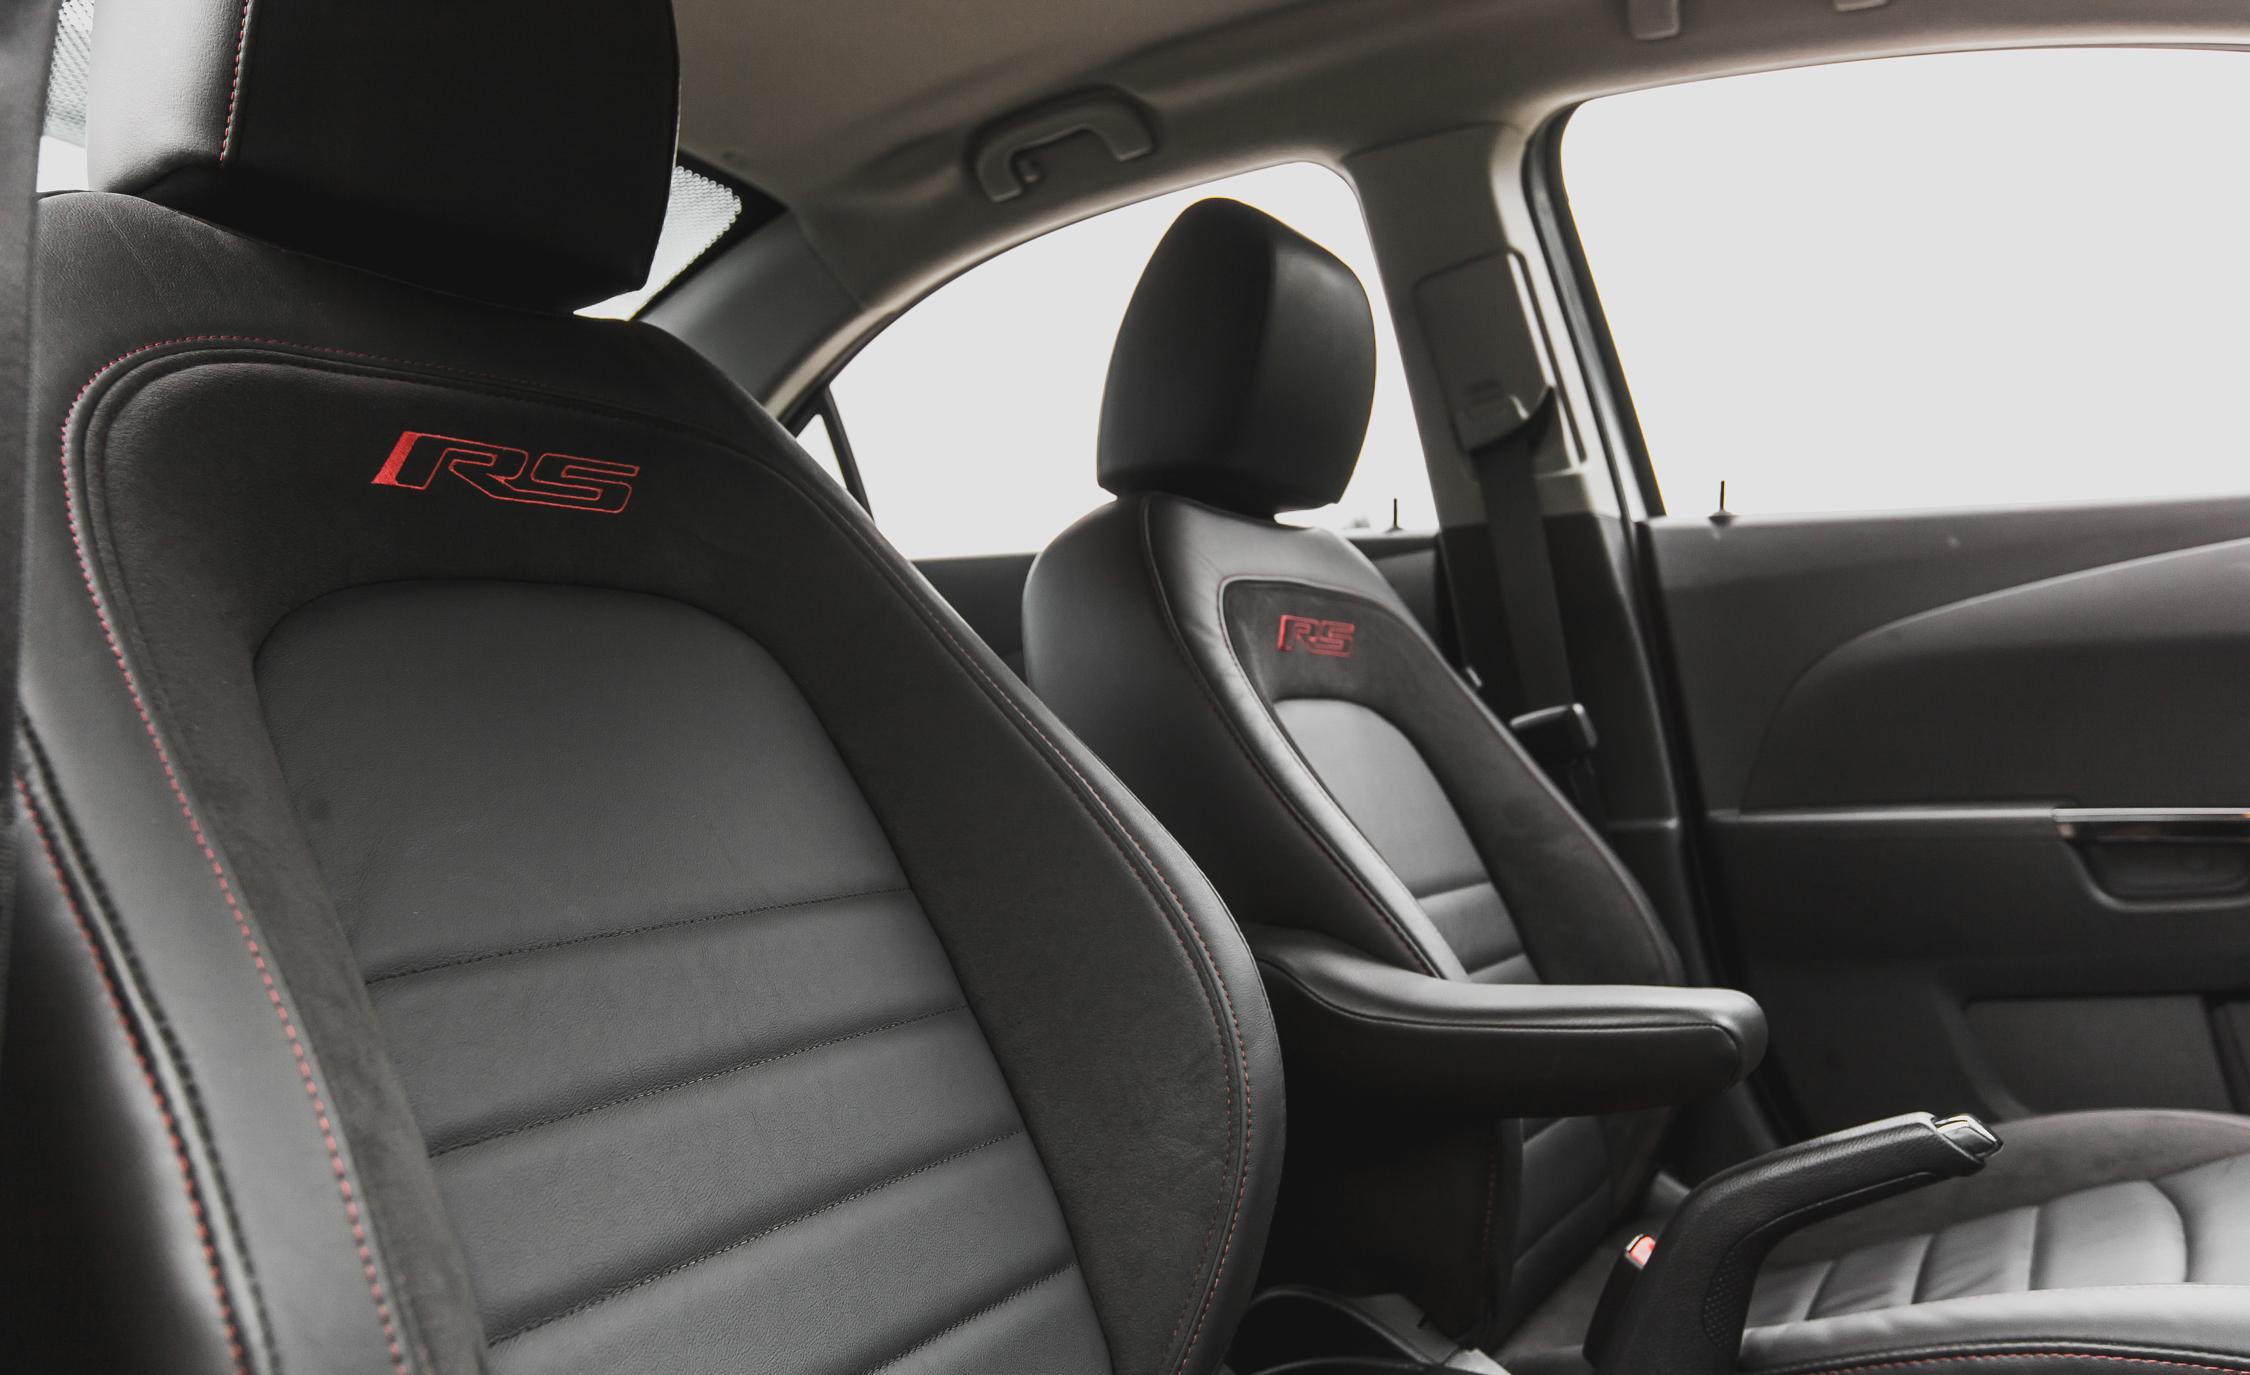 2014 Chevrolet Sonic RS Sedan Interior (View 13 of 27)